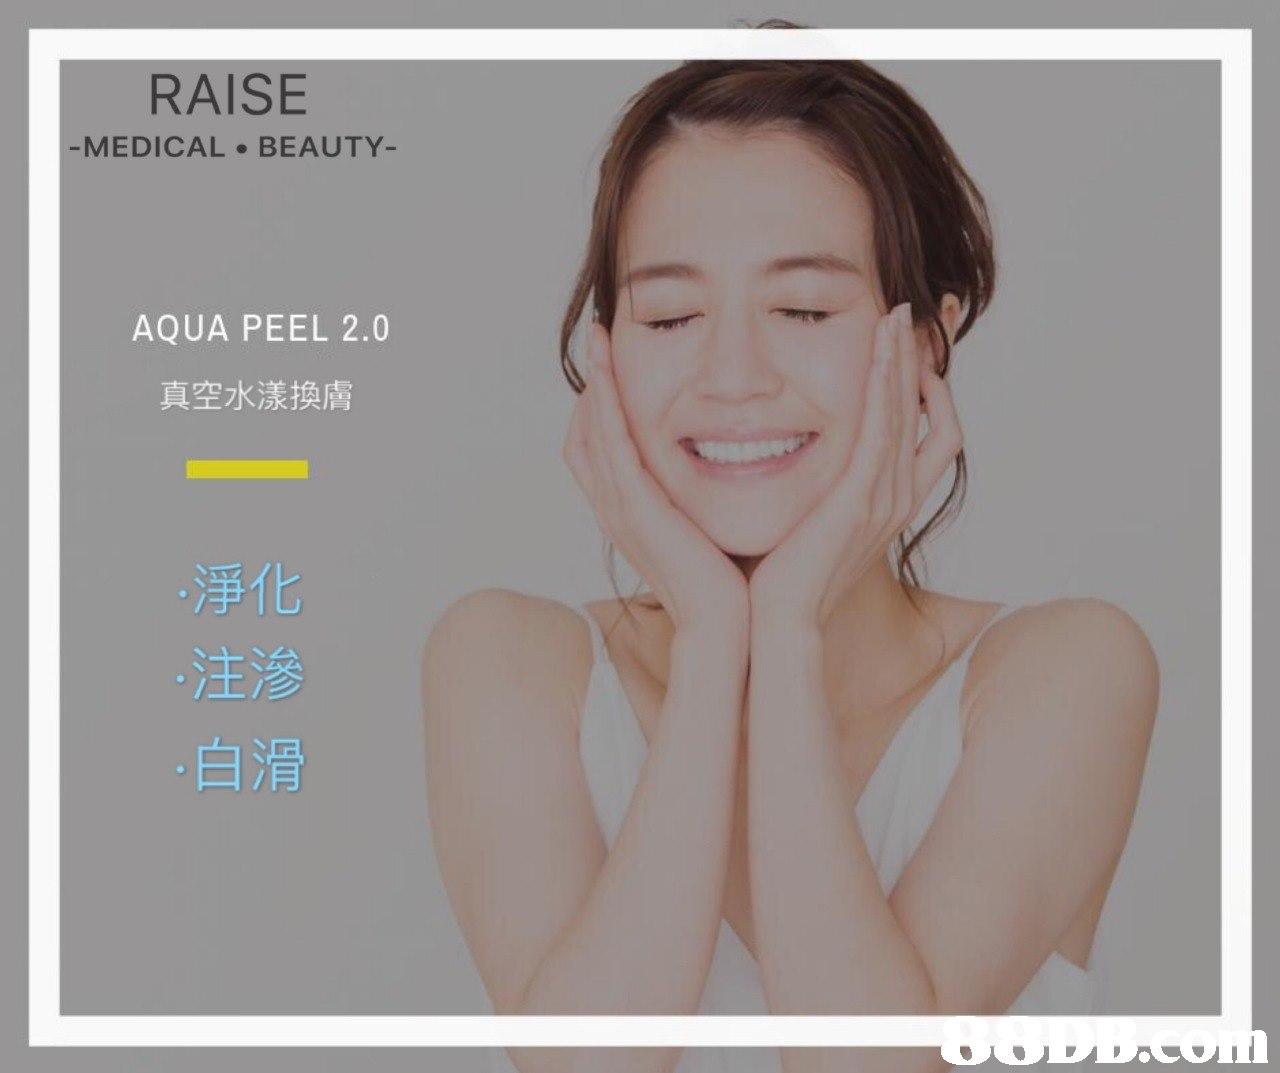 RAISE -MEDICAL BEAUTY- AQUA PEEL 2.0 真空水漾換膚 淨化 注滲 白滑  Face,Skin,Facial expression,Chin,Text